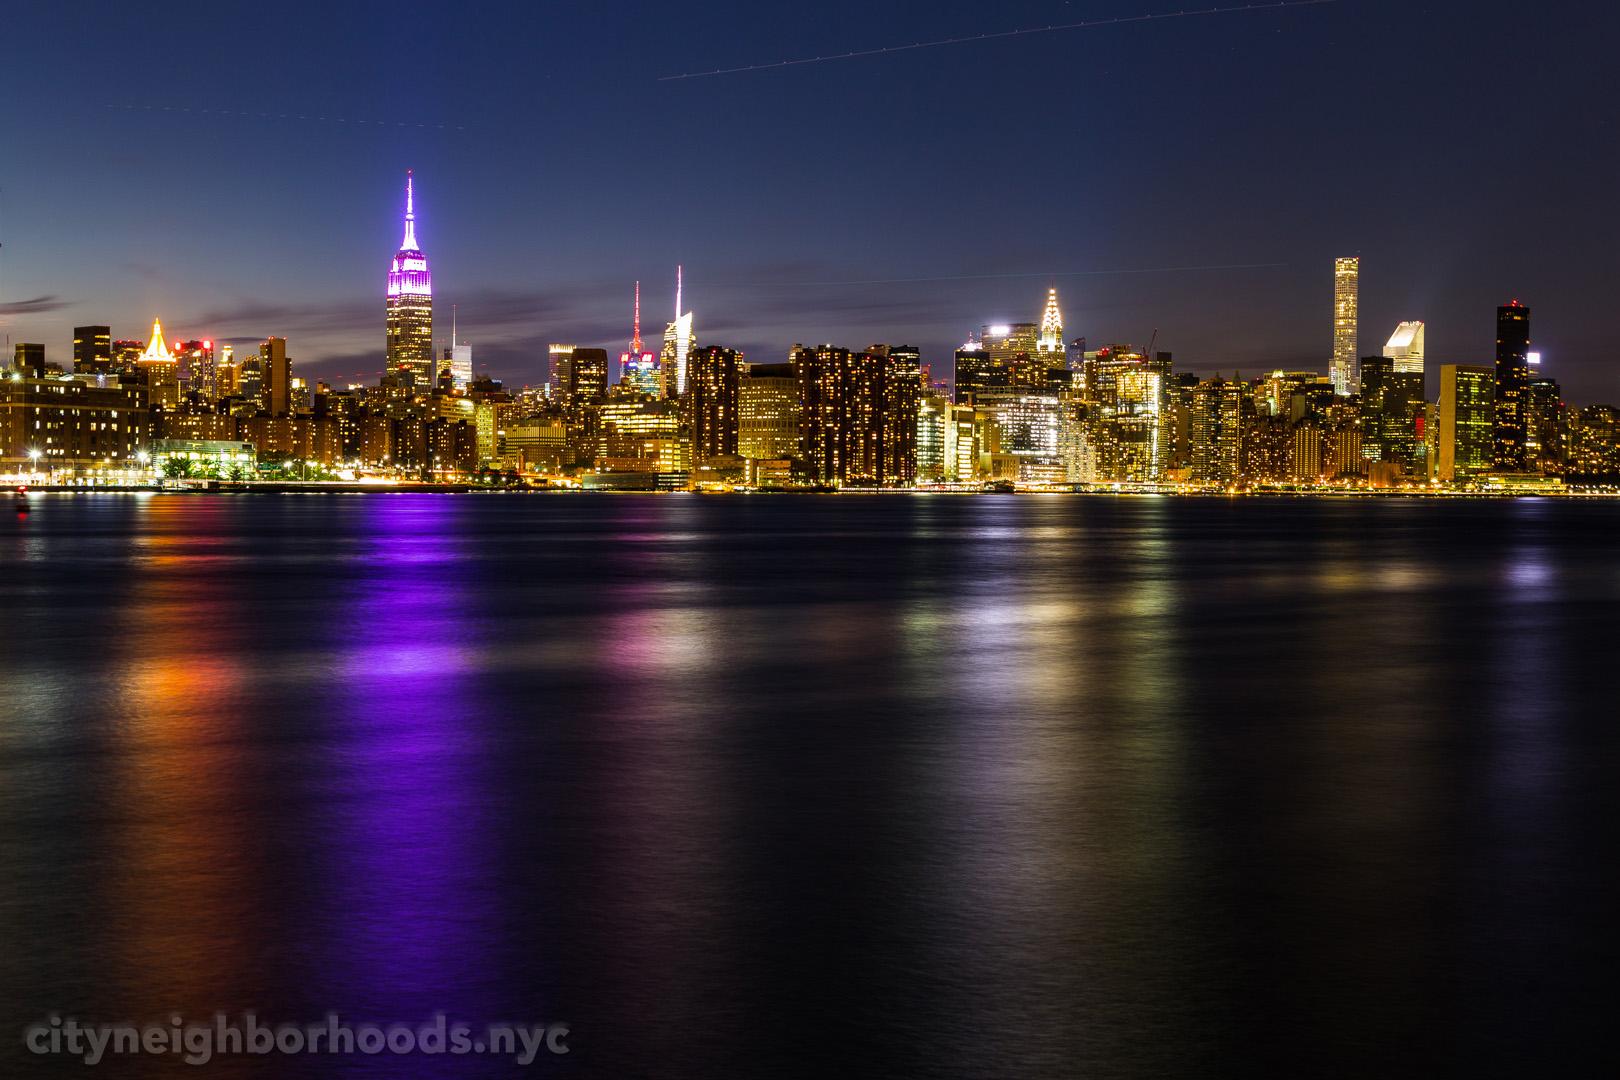 From N5 Street Pier - Williamsburg - Brooklyn - NYC